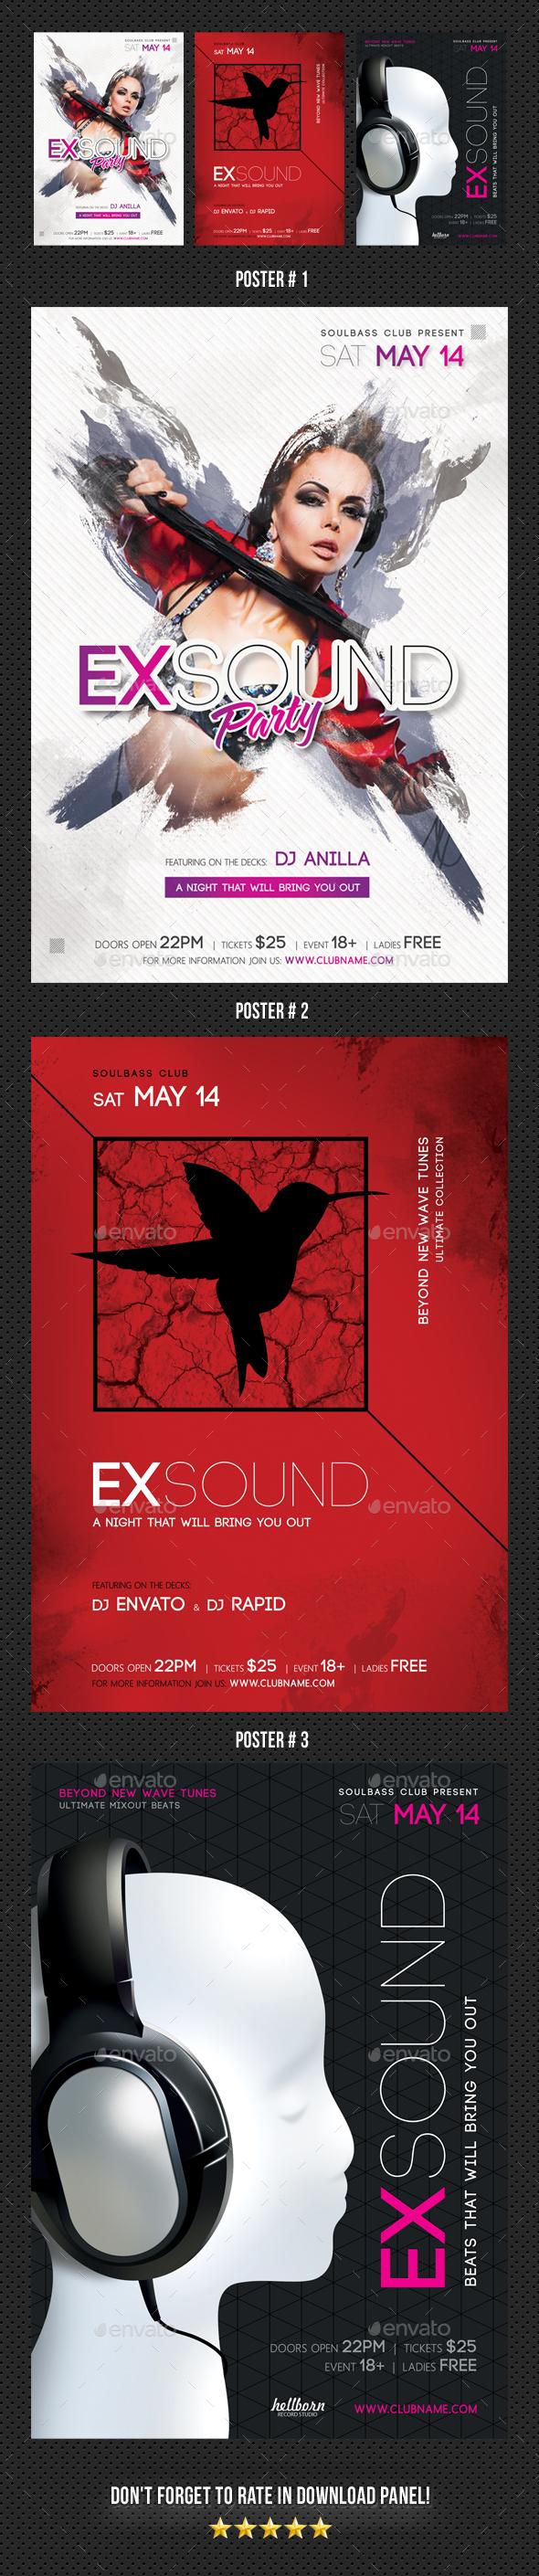 3 Exsound Music Poster Bundle - Signage Print Templates